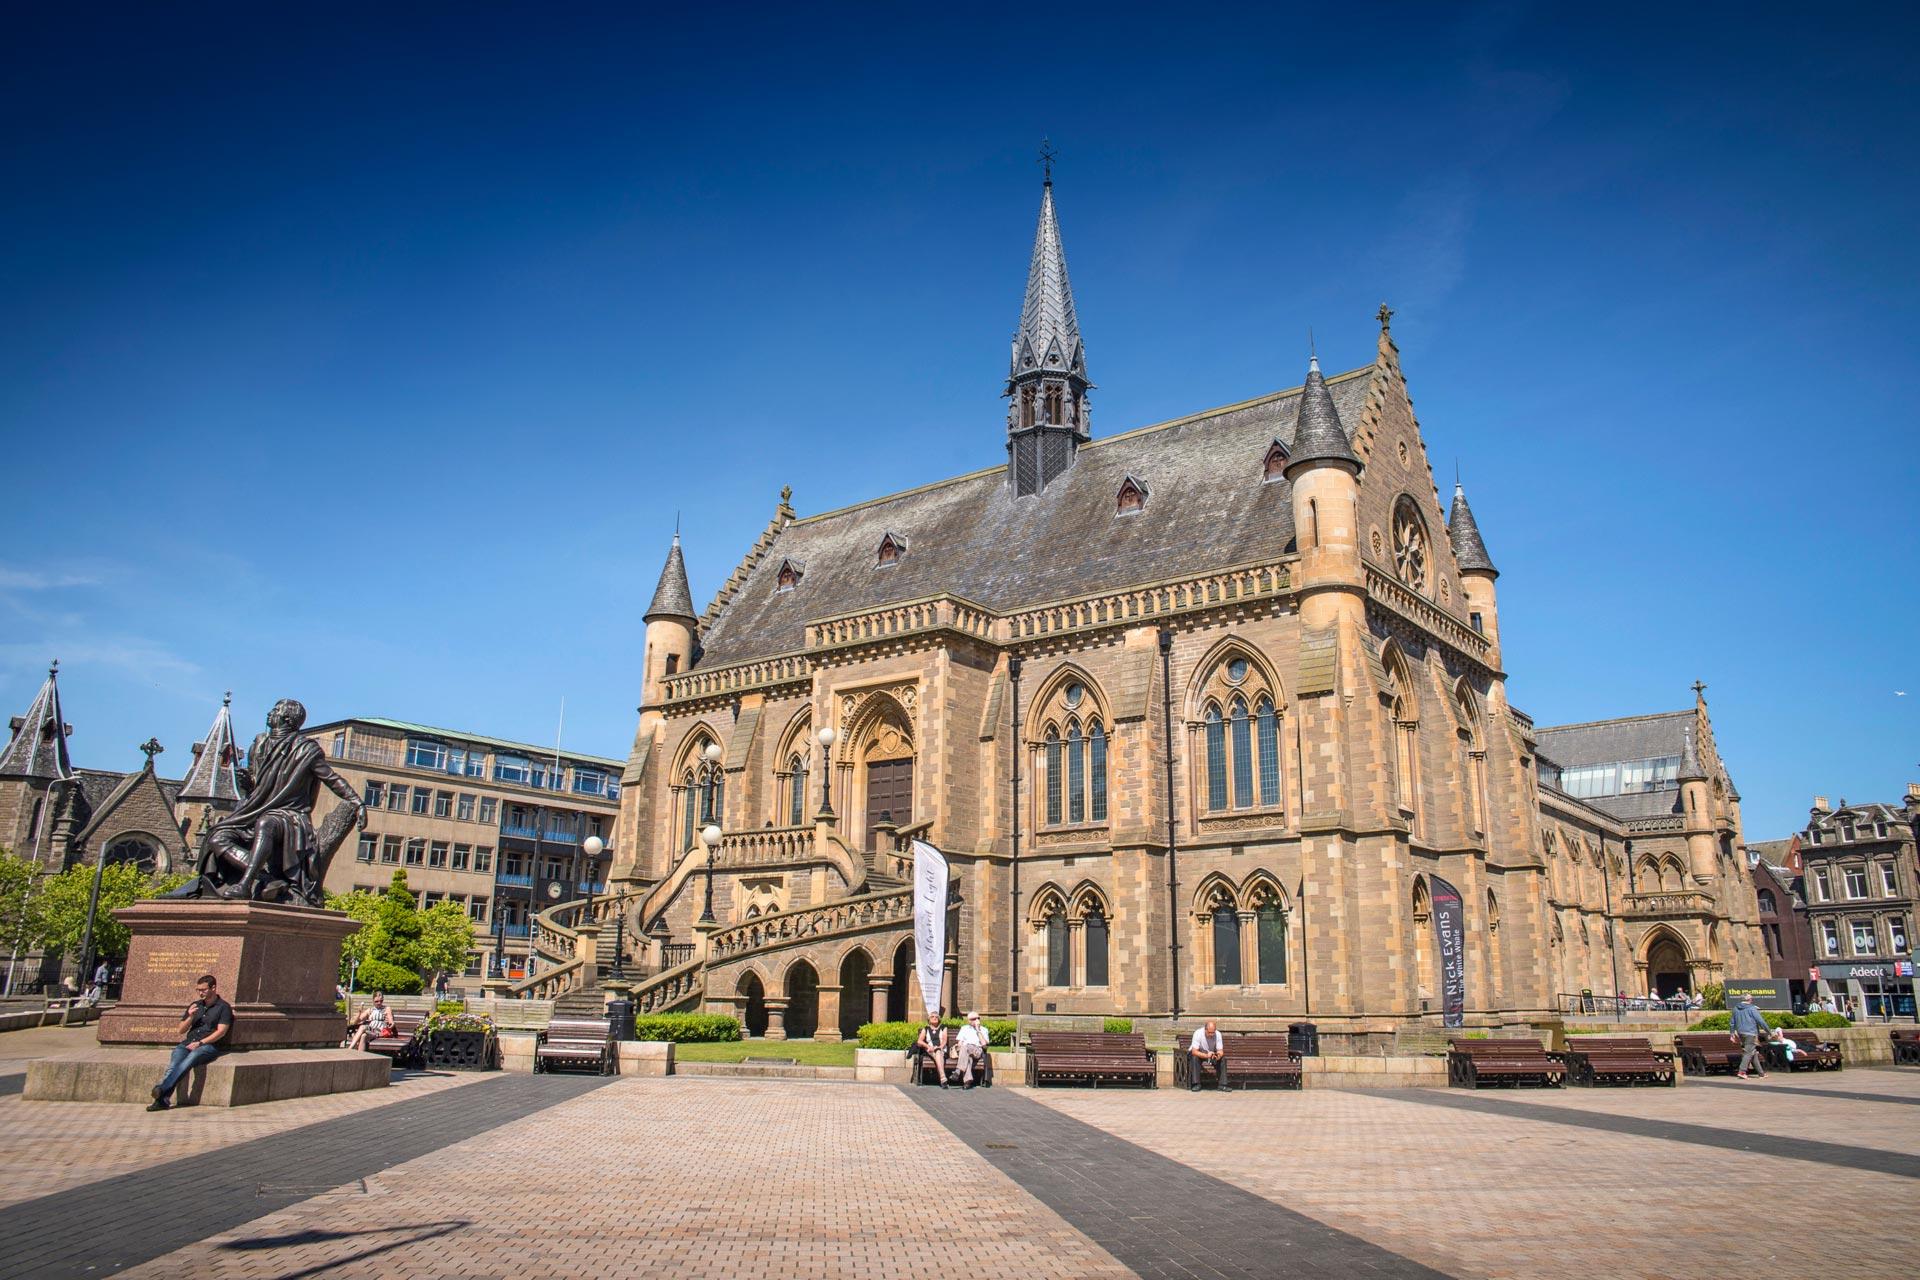 Dundee - Holidays, Breaks & Tourist Information | VisitScotland